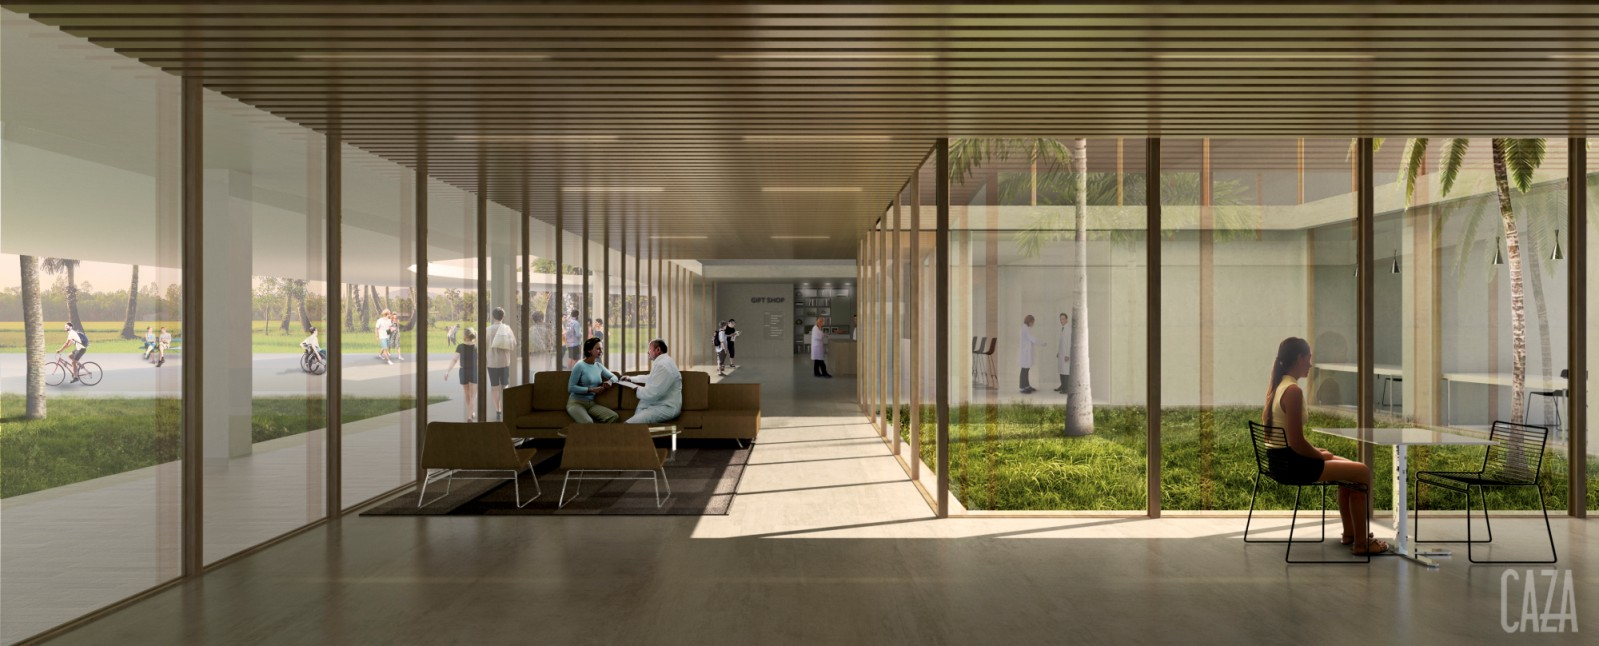 Baler Hospital